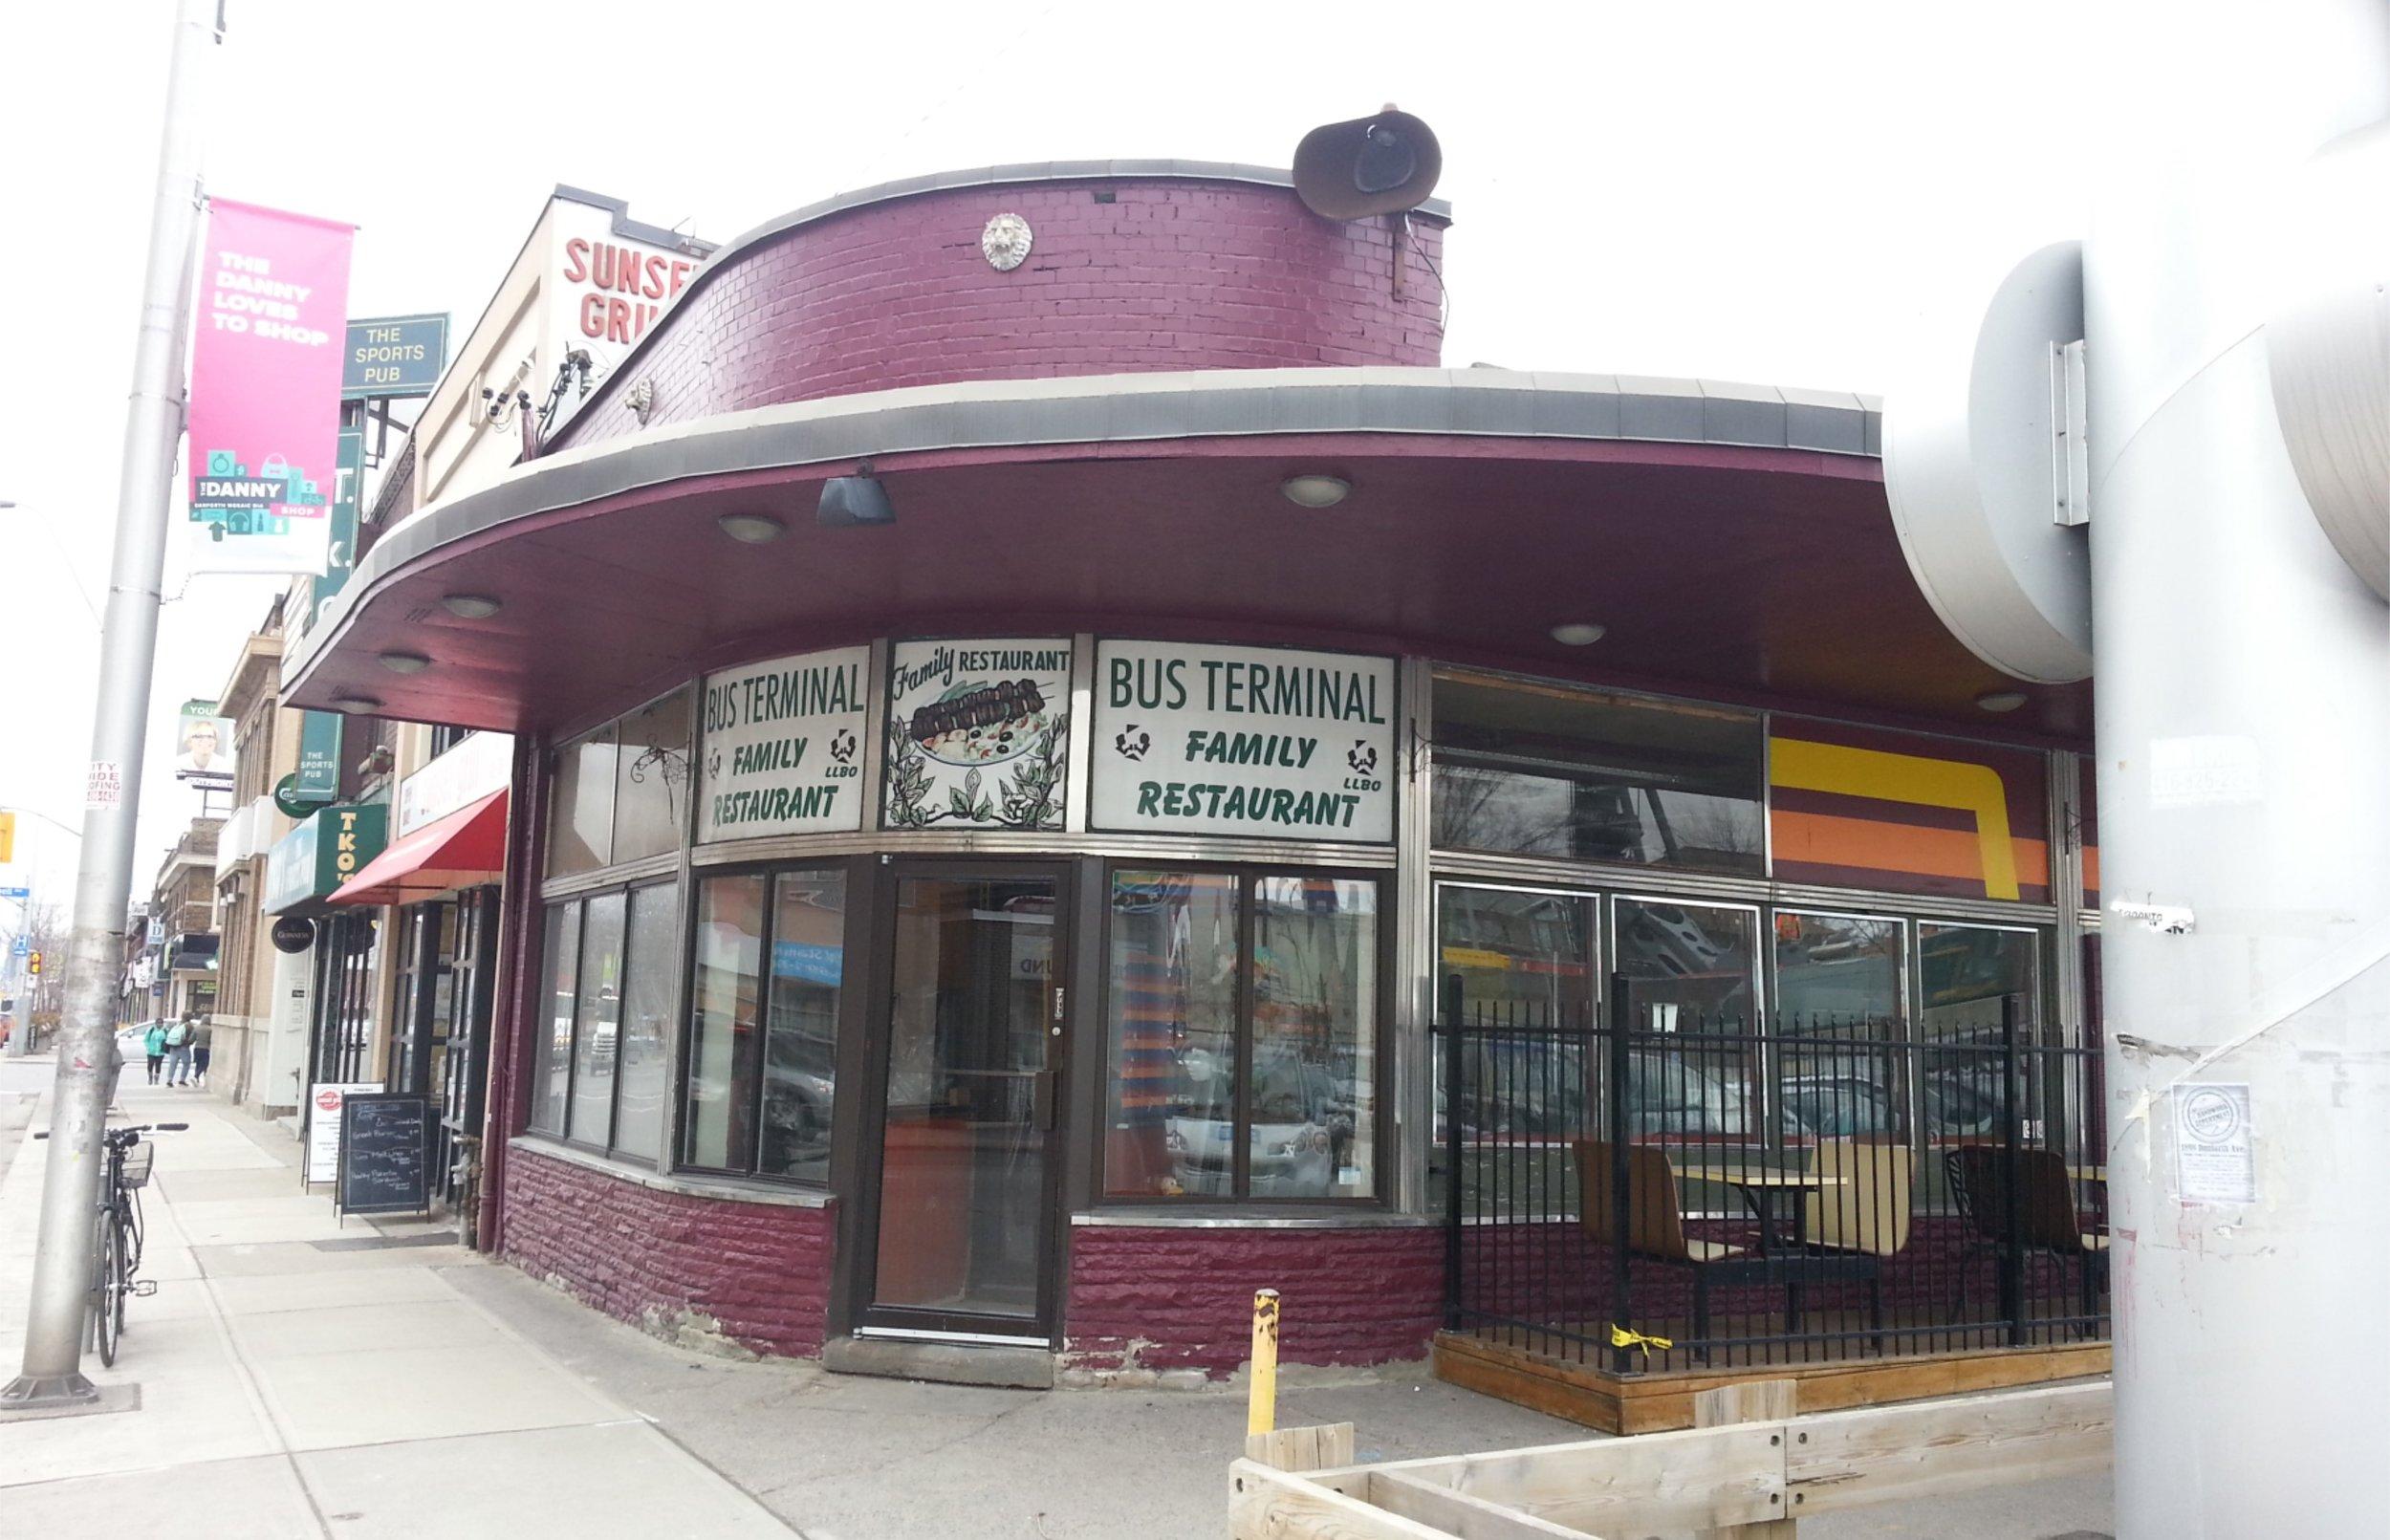 Toronto quietly loses landmark bus terminal diner - BlogTO